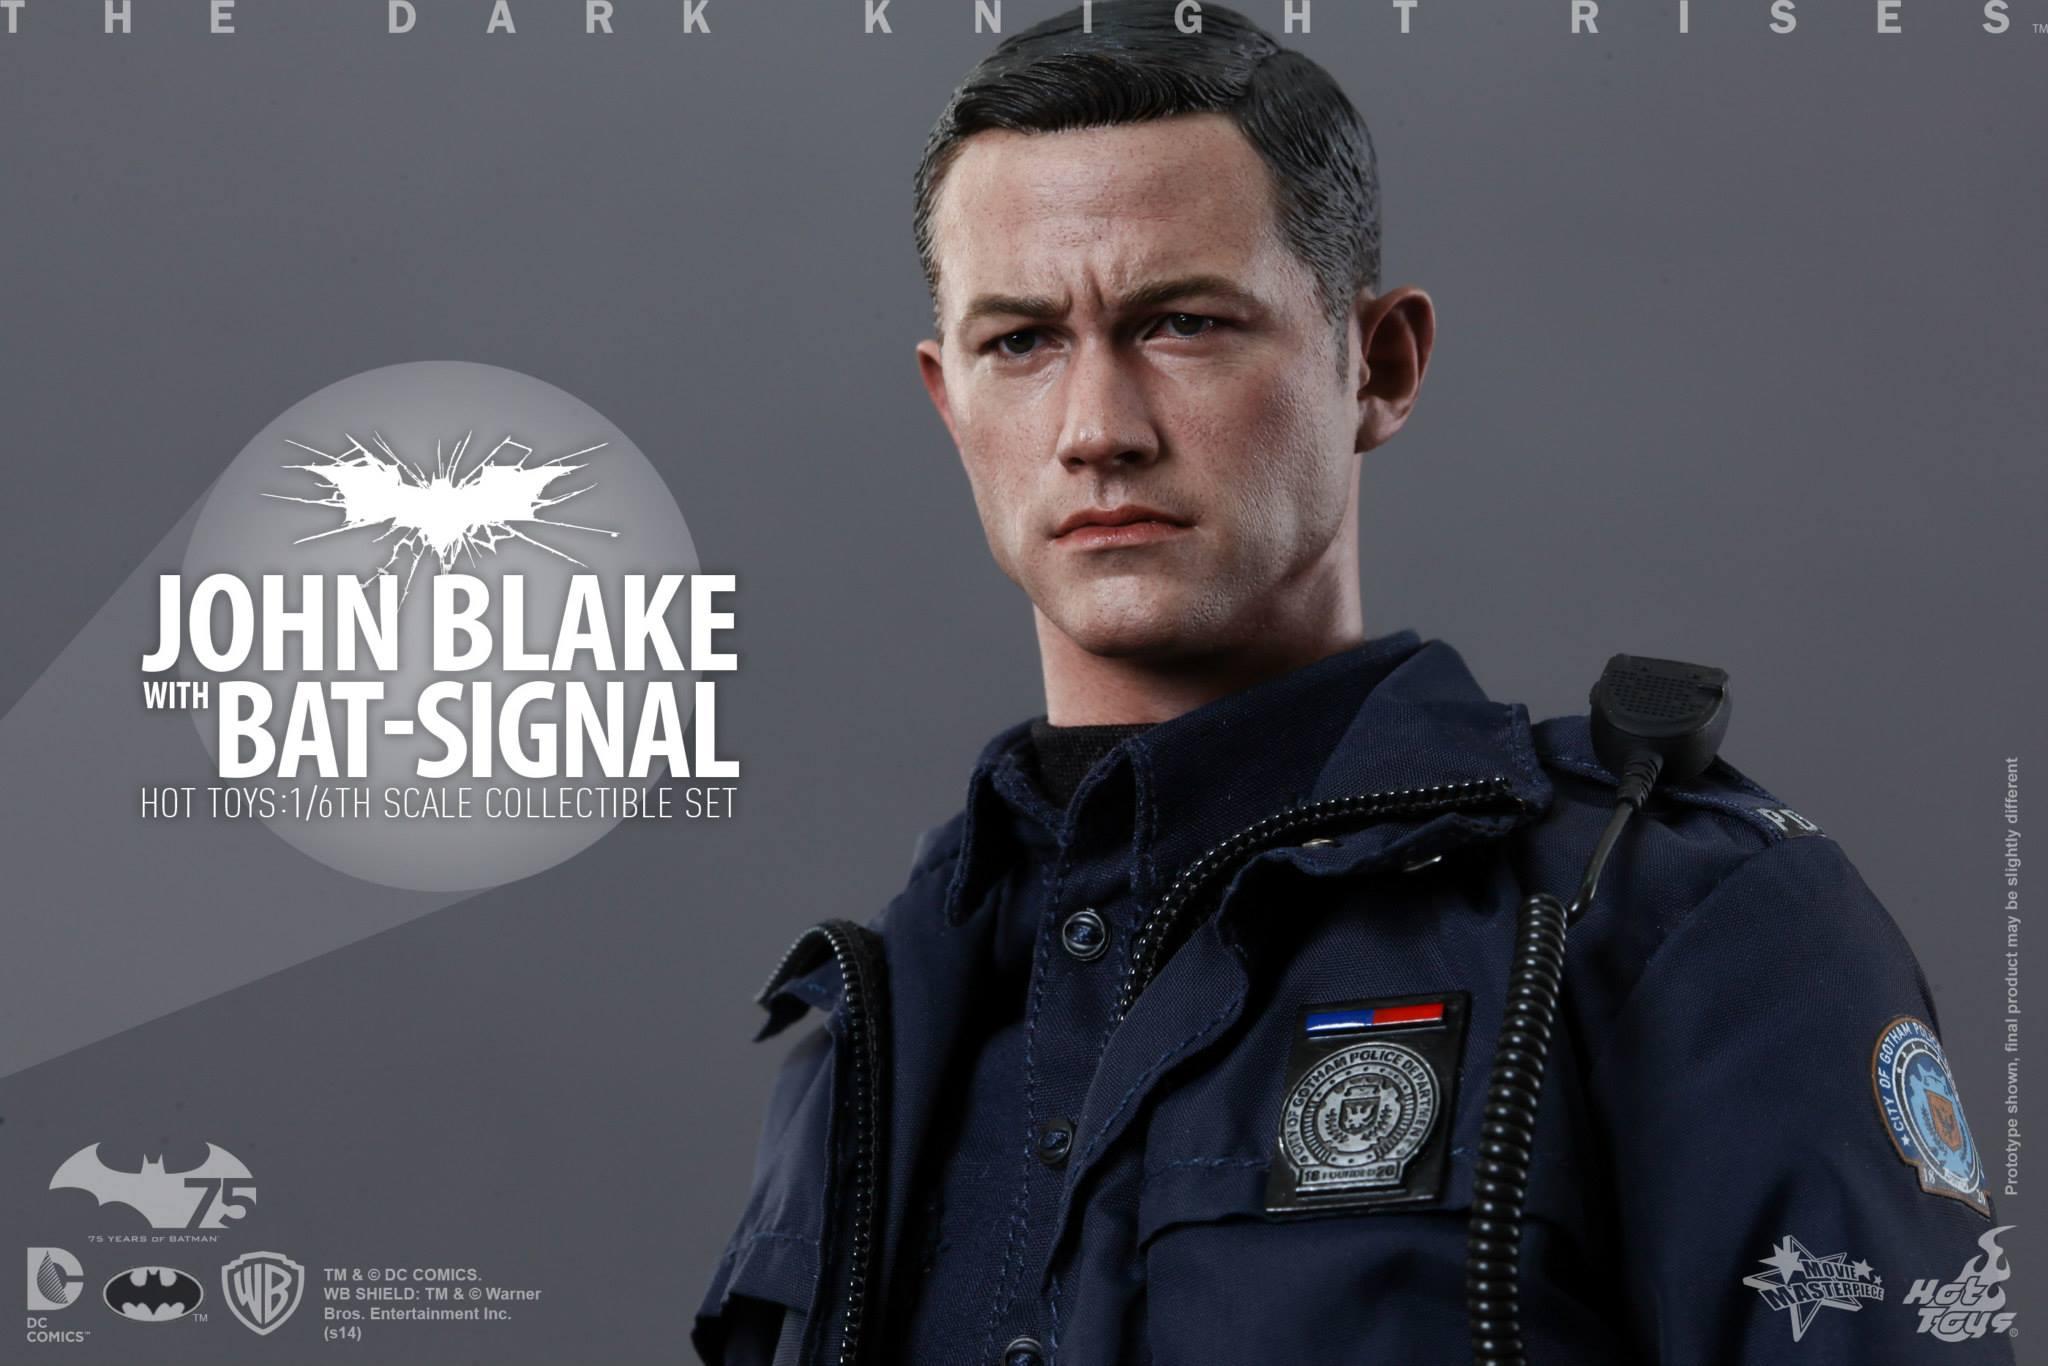 THE DARK KNIGHT RISES - Lt. JIM GORDON & JOHN BLAKE w/BATSIGNAL 690238104